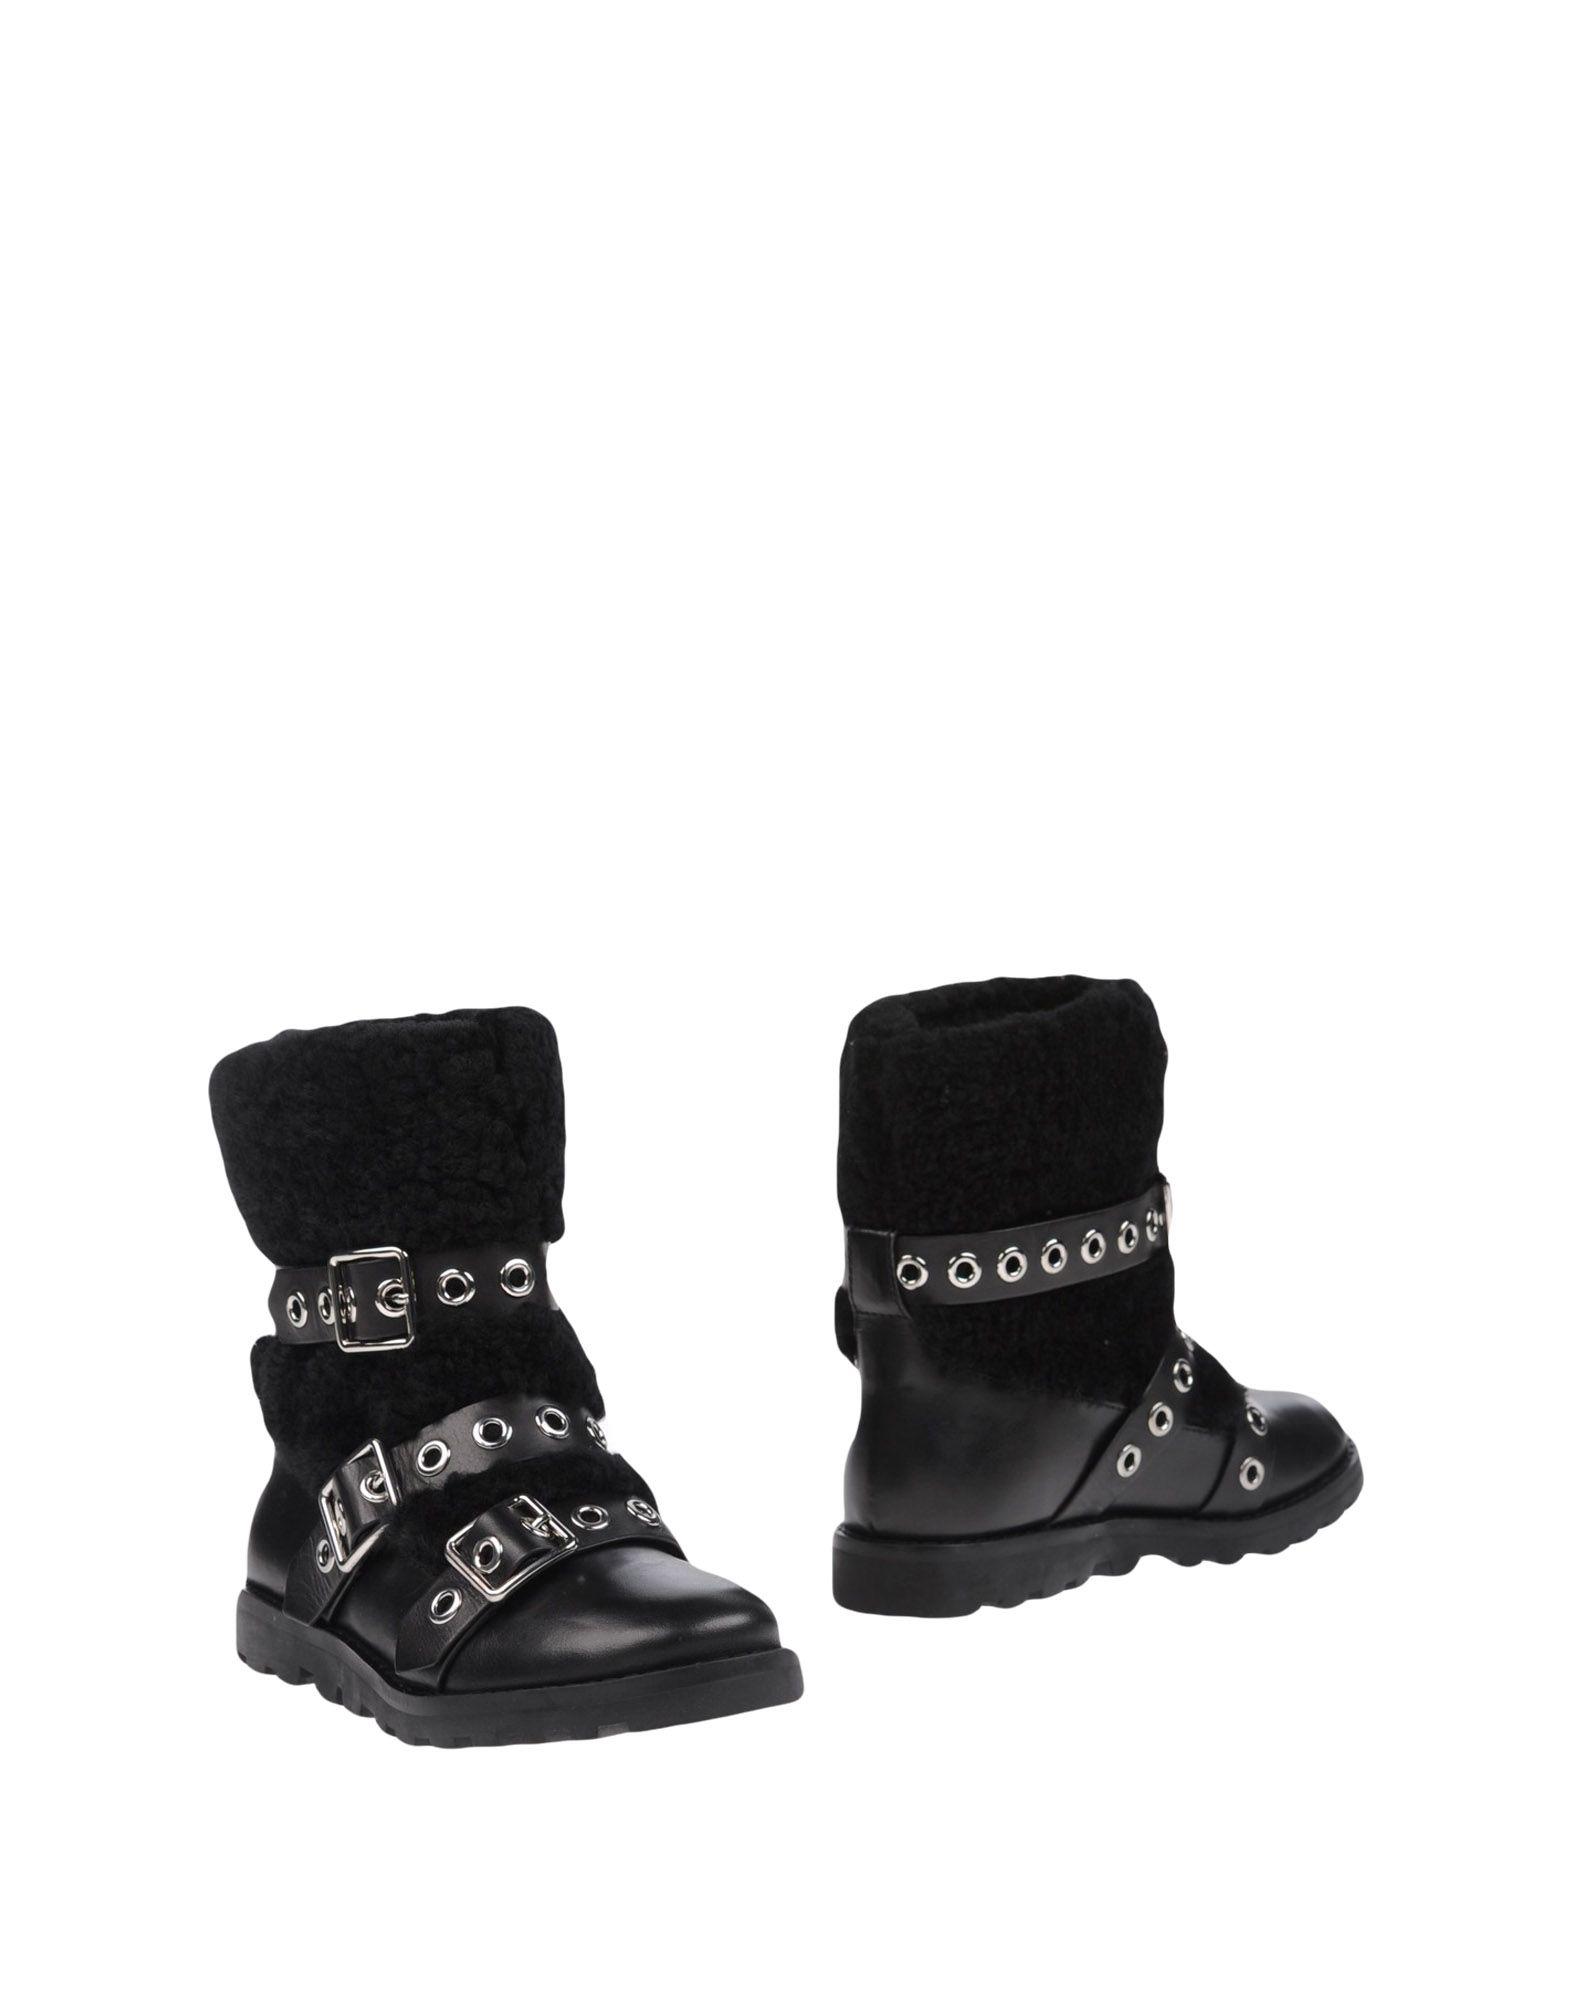 Rabatt Rabatt Rabatt Schuhe Marc By Marc Jacobs Stiefelette Damen 11224565RR 925e5c